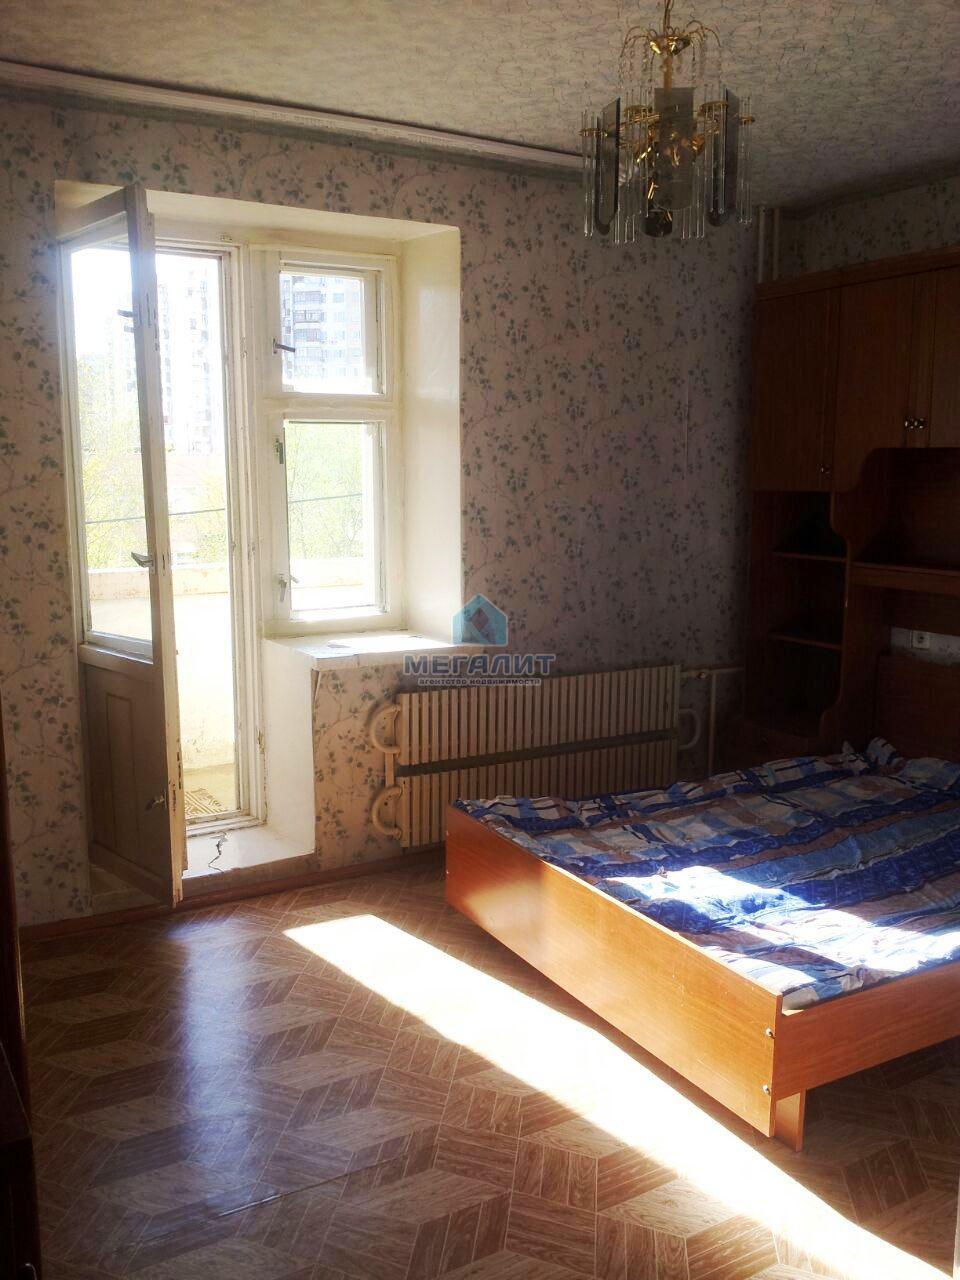 Двухкомнатная квартира в Ново-Савиновском районе! (миниатюра №6)